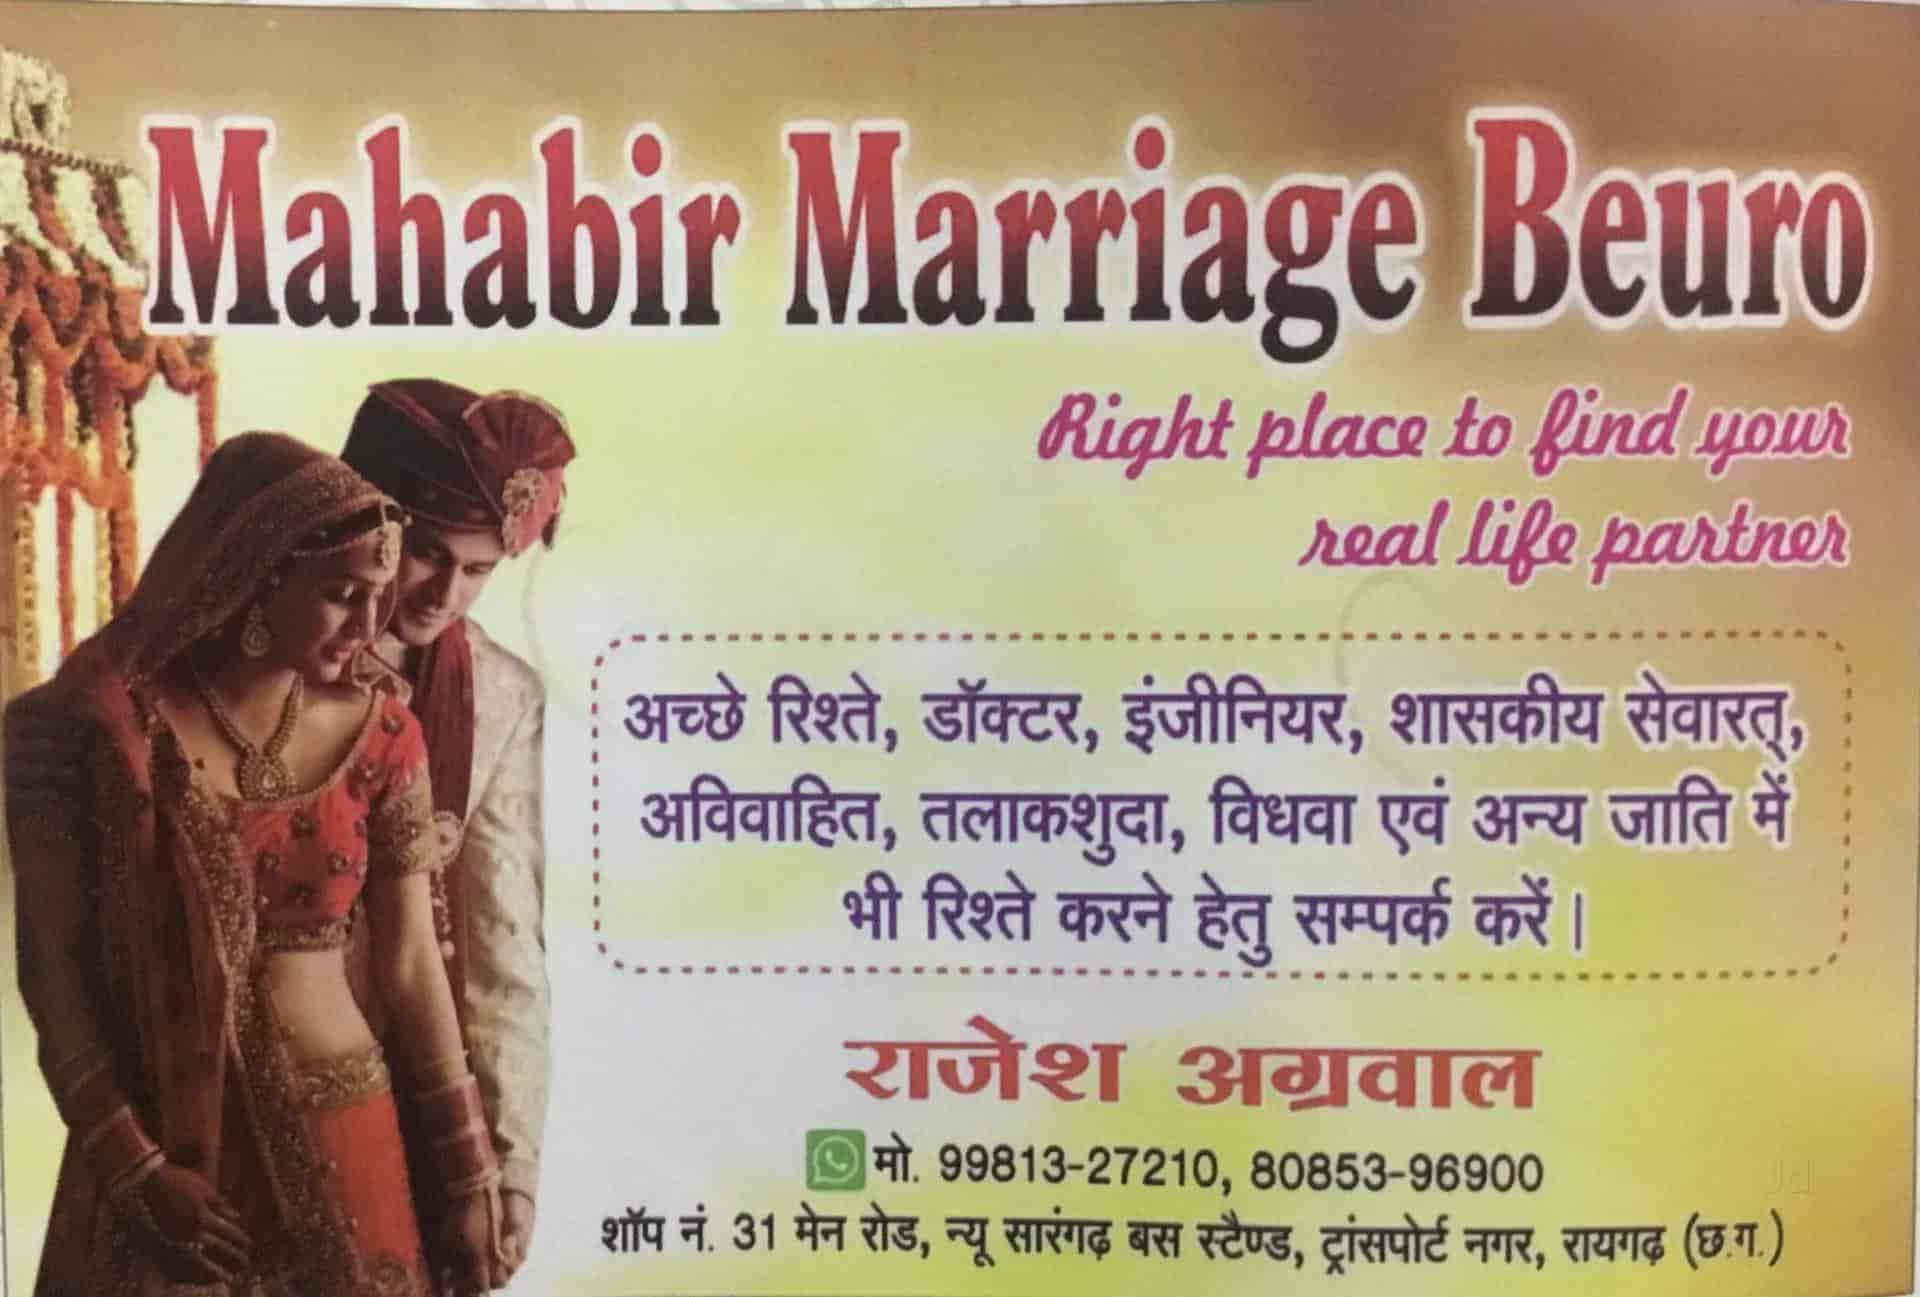 Mahabir Marriage Beuro, Raigarh HO - Matrimonial Bureaus in Raigarh